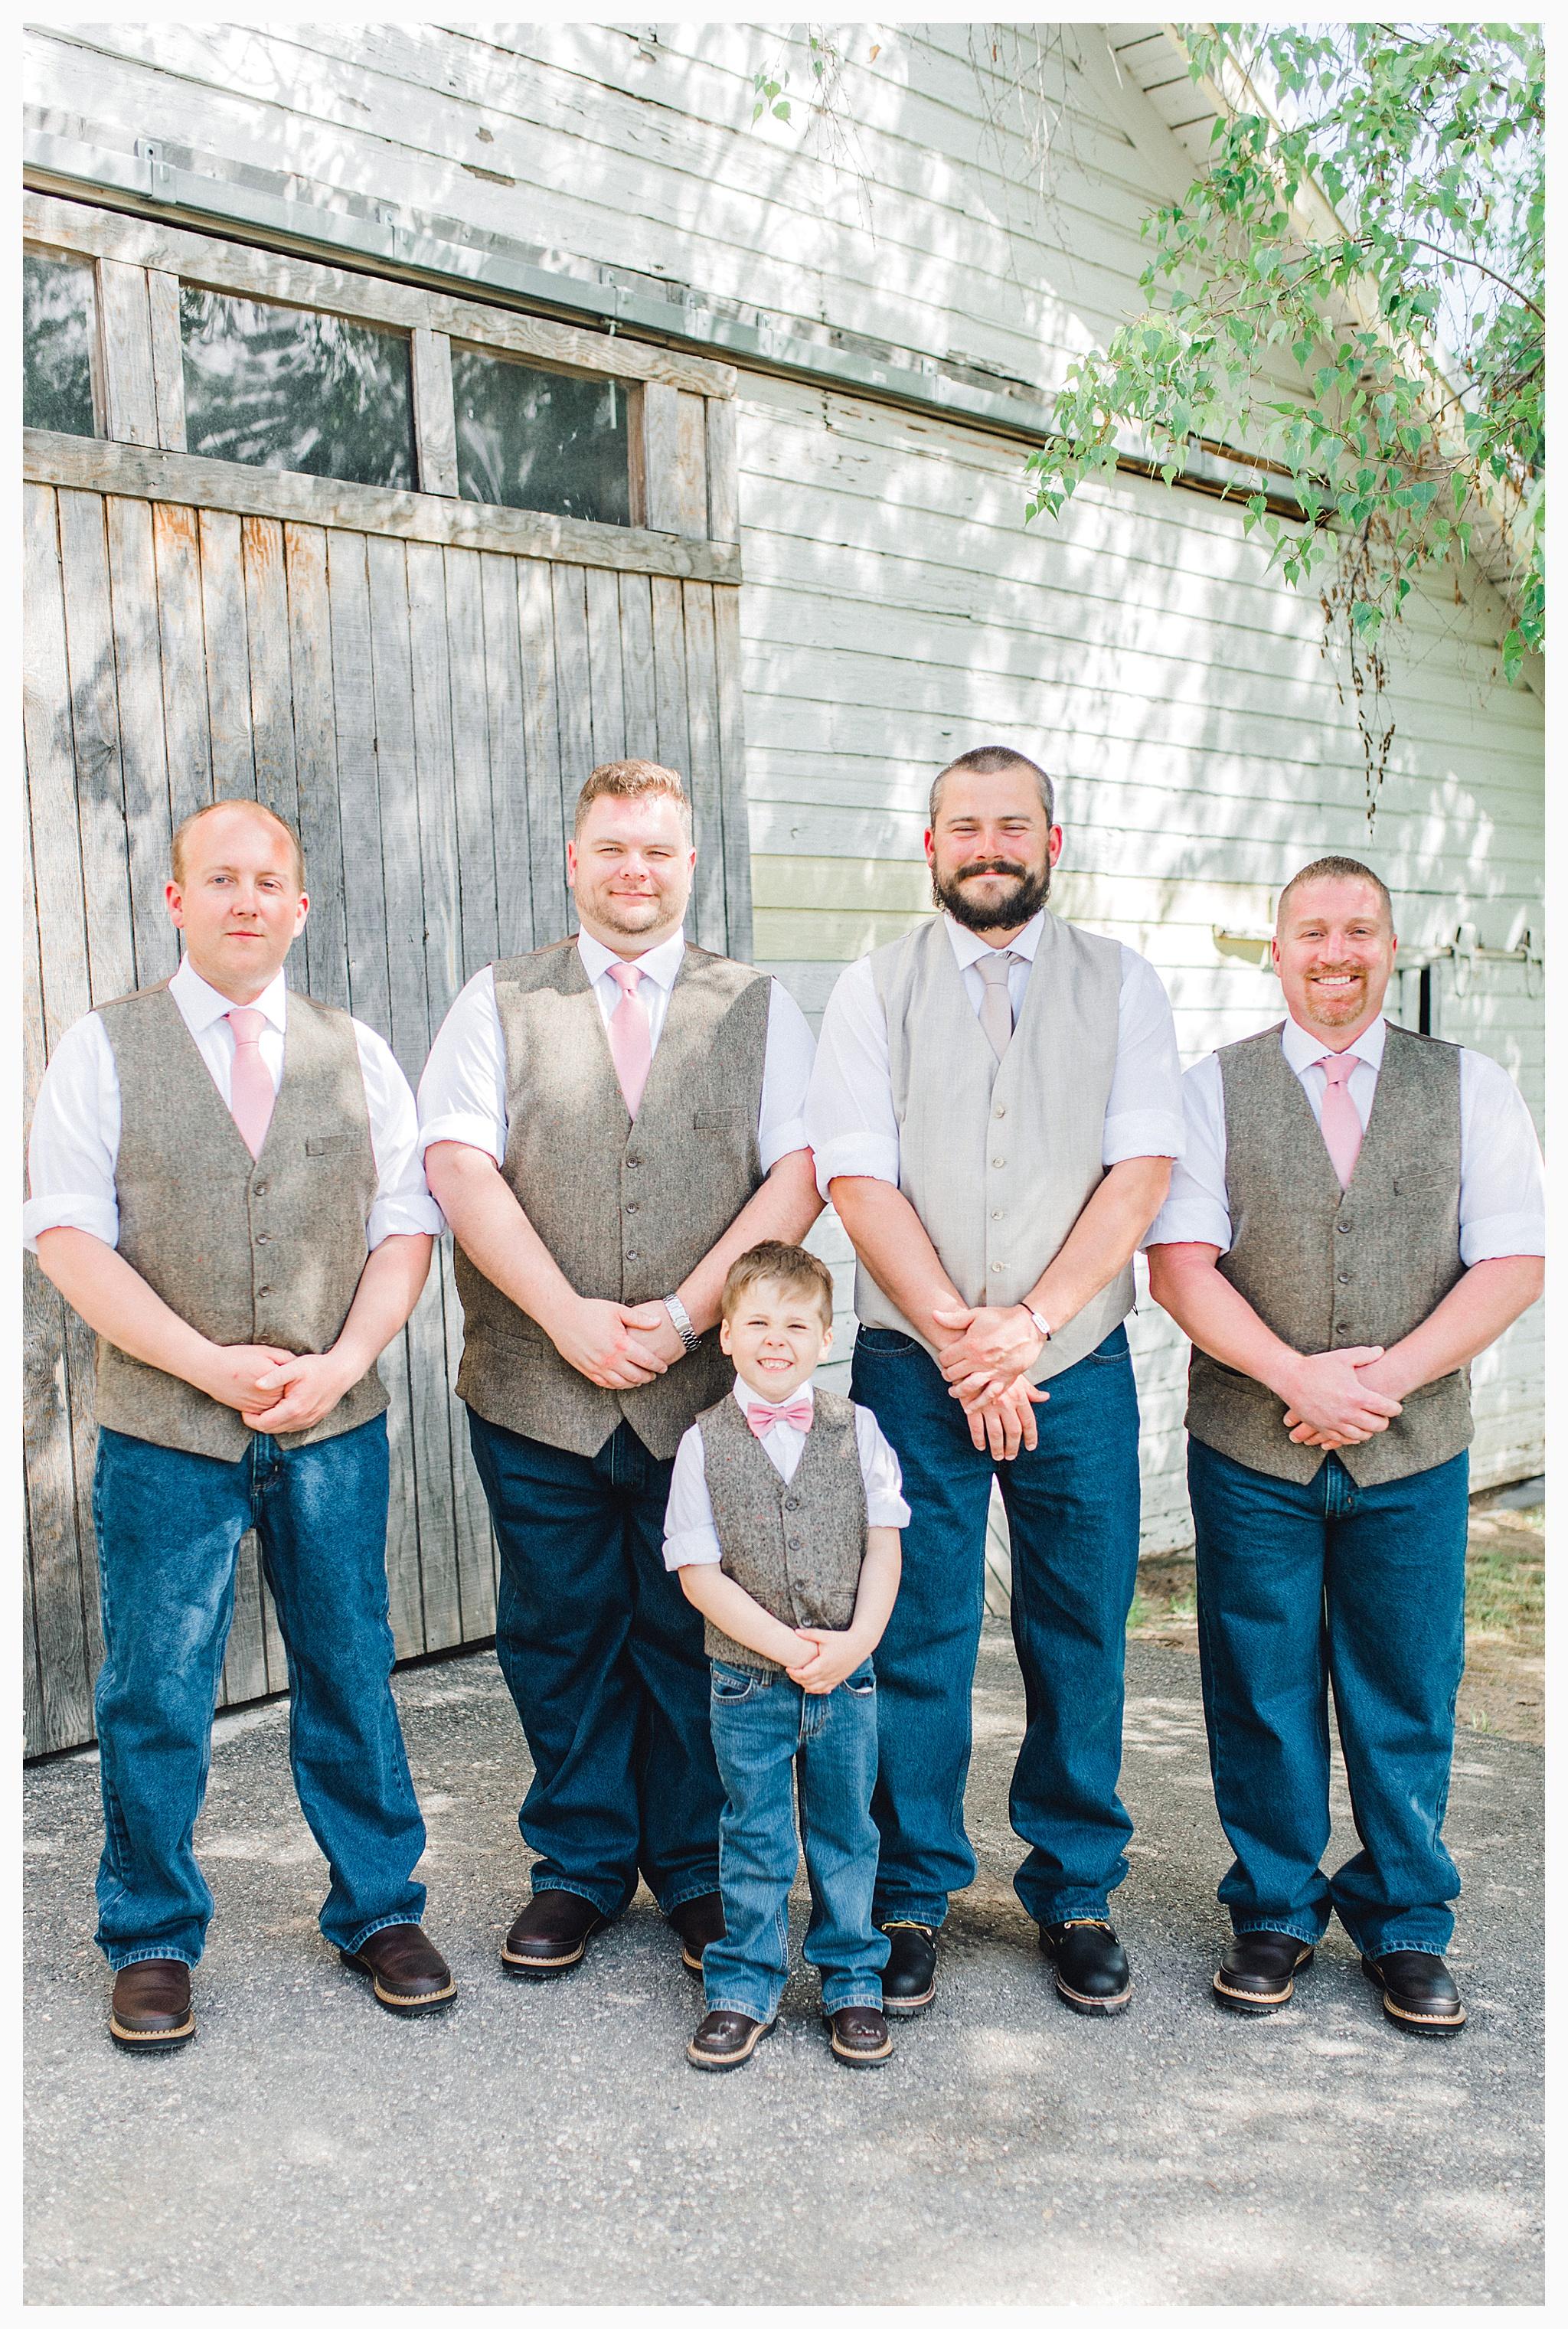 Rustic barn wedding in Wenatchee Washington at Sunshine Ranch on Easy Street, Emma Rose Company Seattle PNW Light and Airy Wedding Photographer_0053.jpg